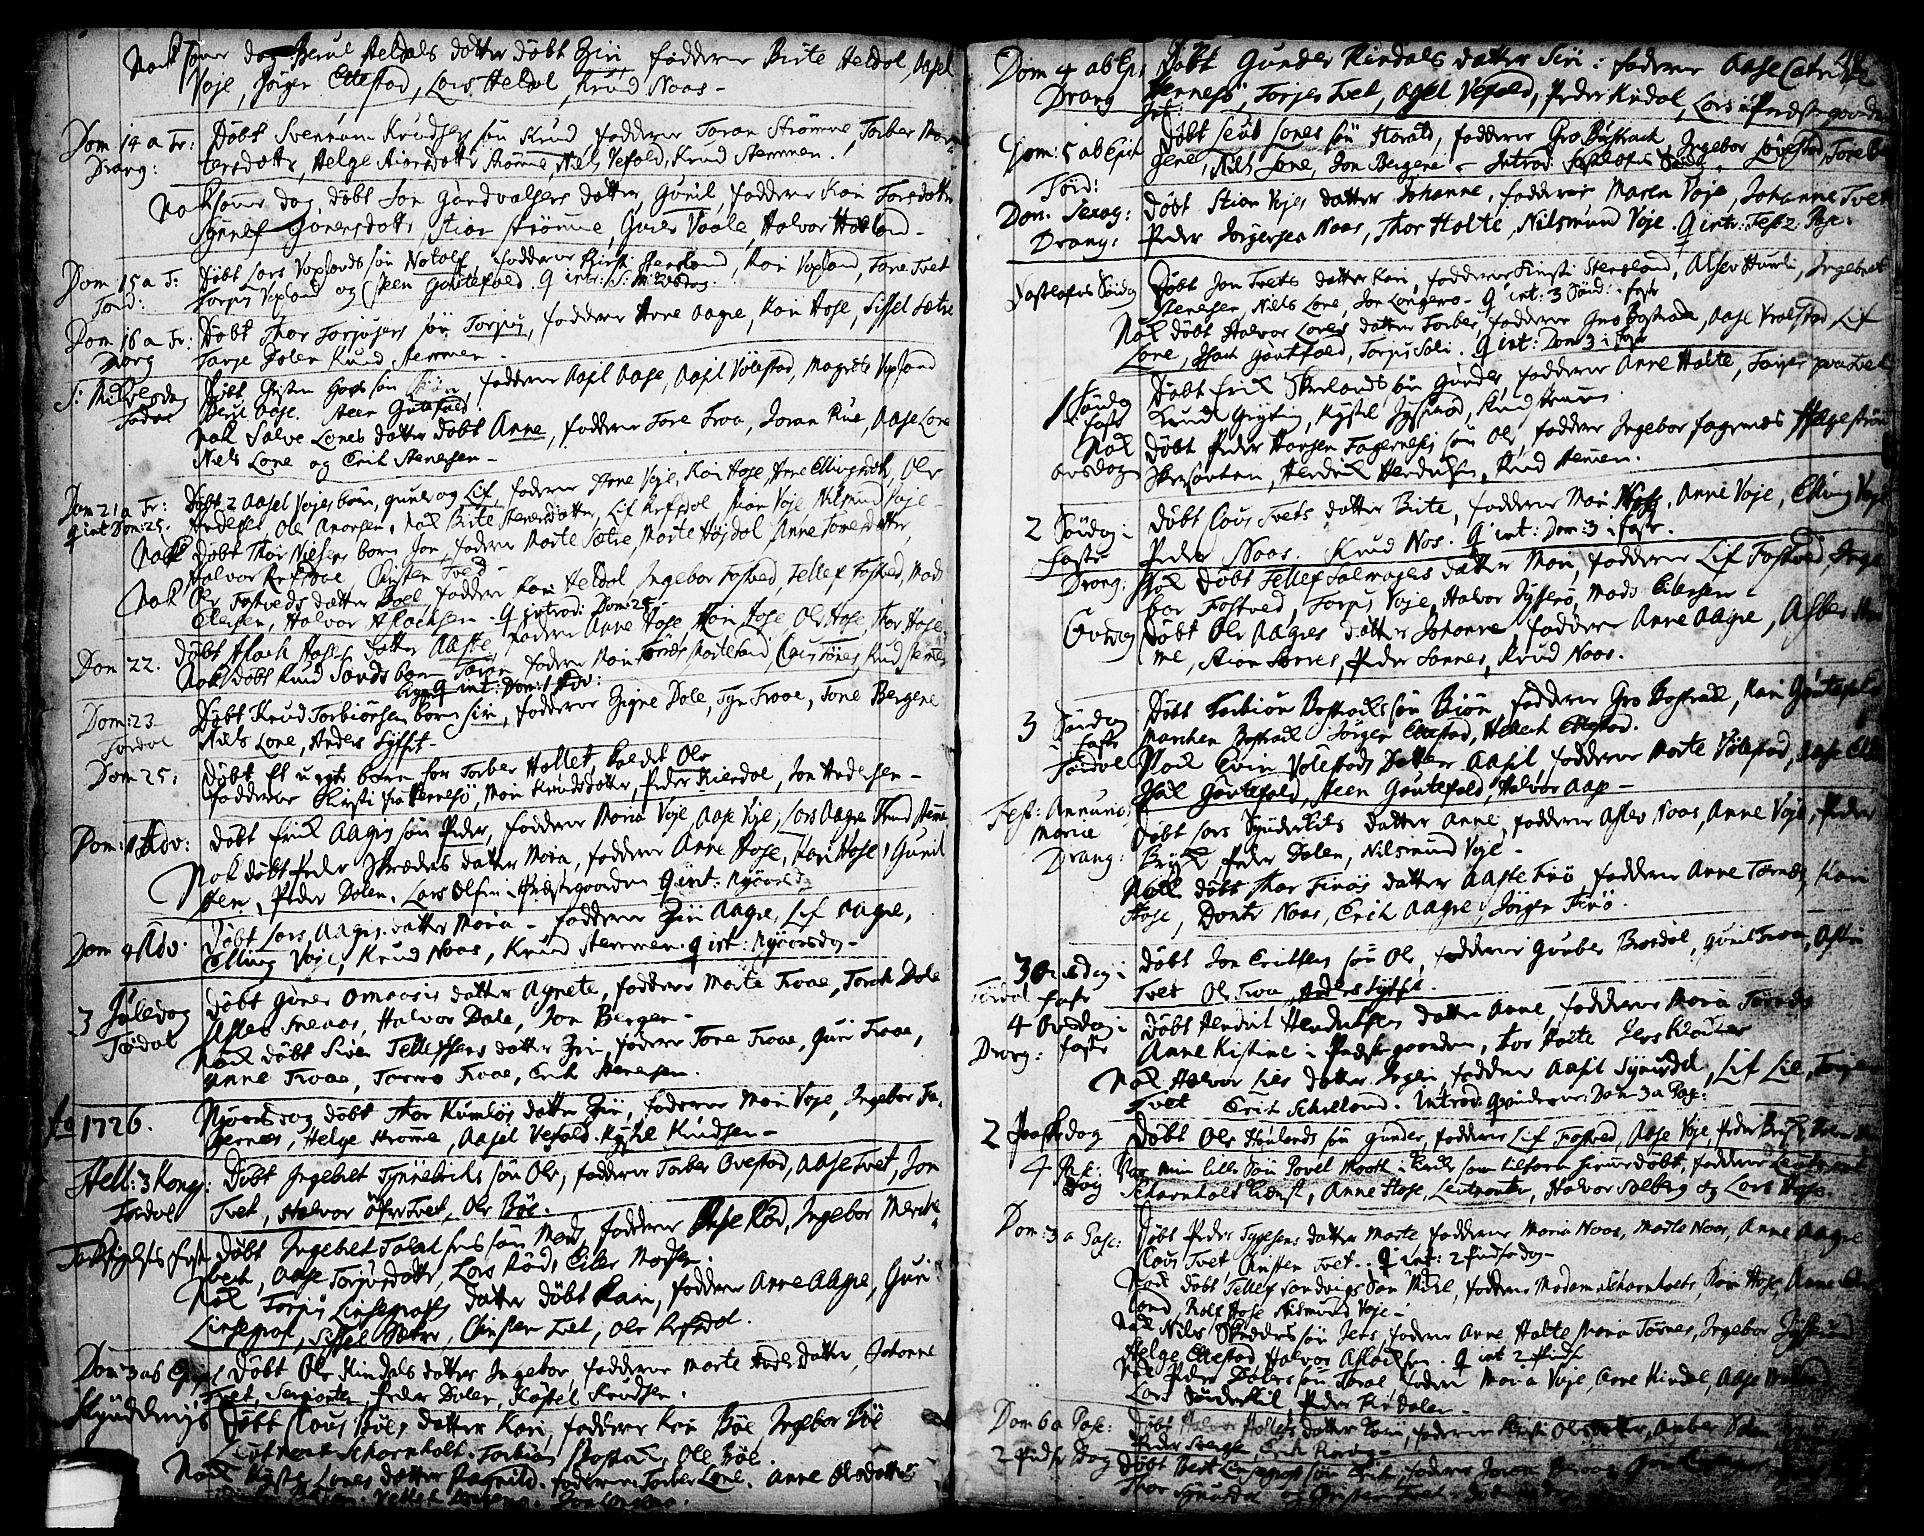 SAKO, Drangedal kirkebøker, F/Fa/L0001: Ministerialbok nr. 1, 1697-1767, s. 48